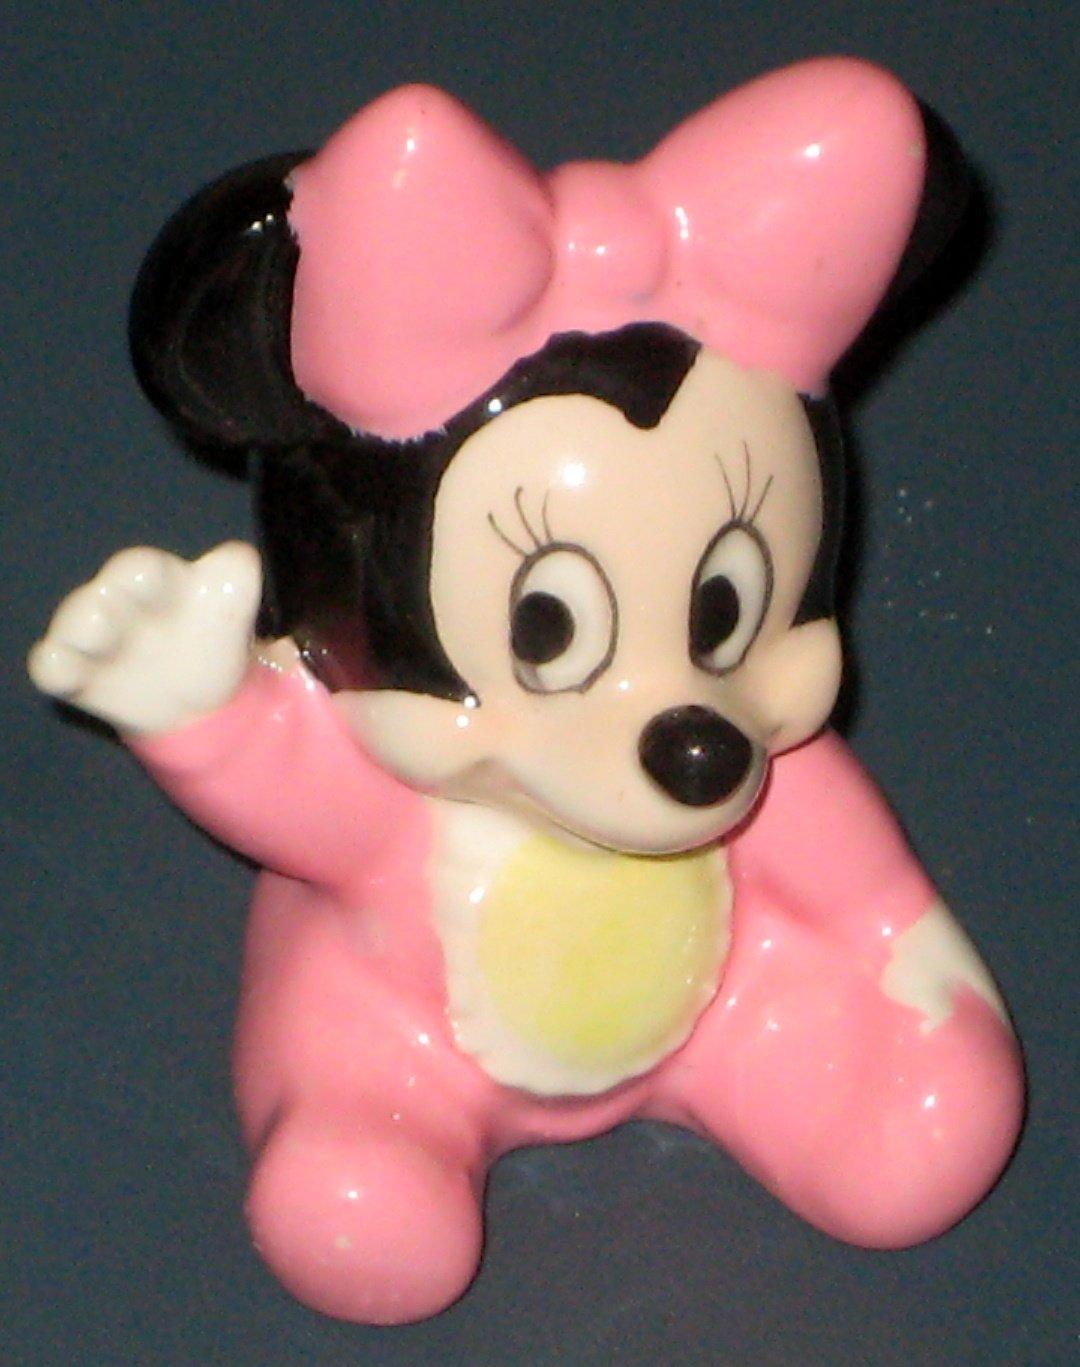 Baby Minnie Mouse Ceramic Figure Figurine Pink Disney